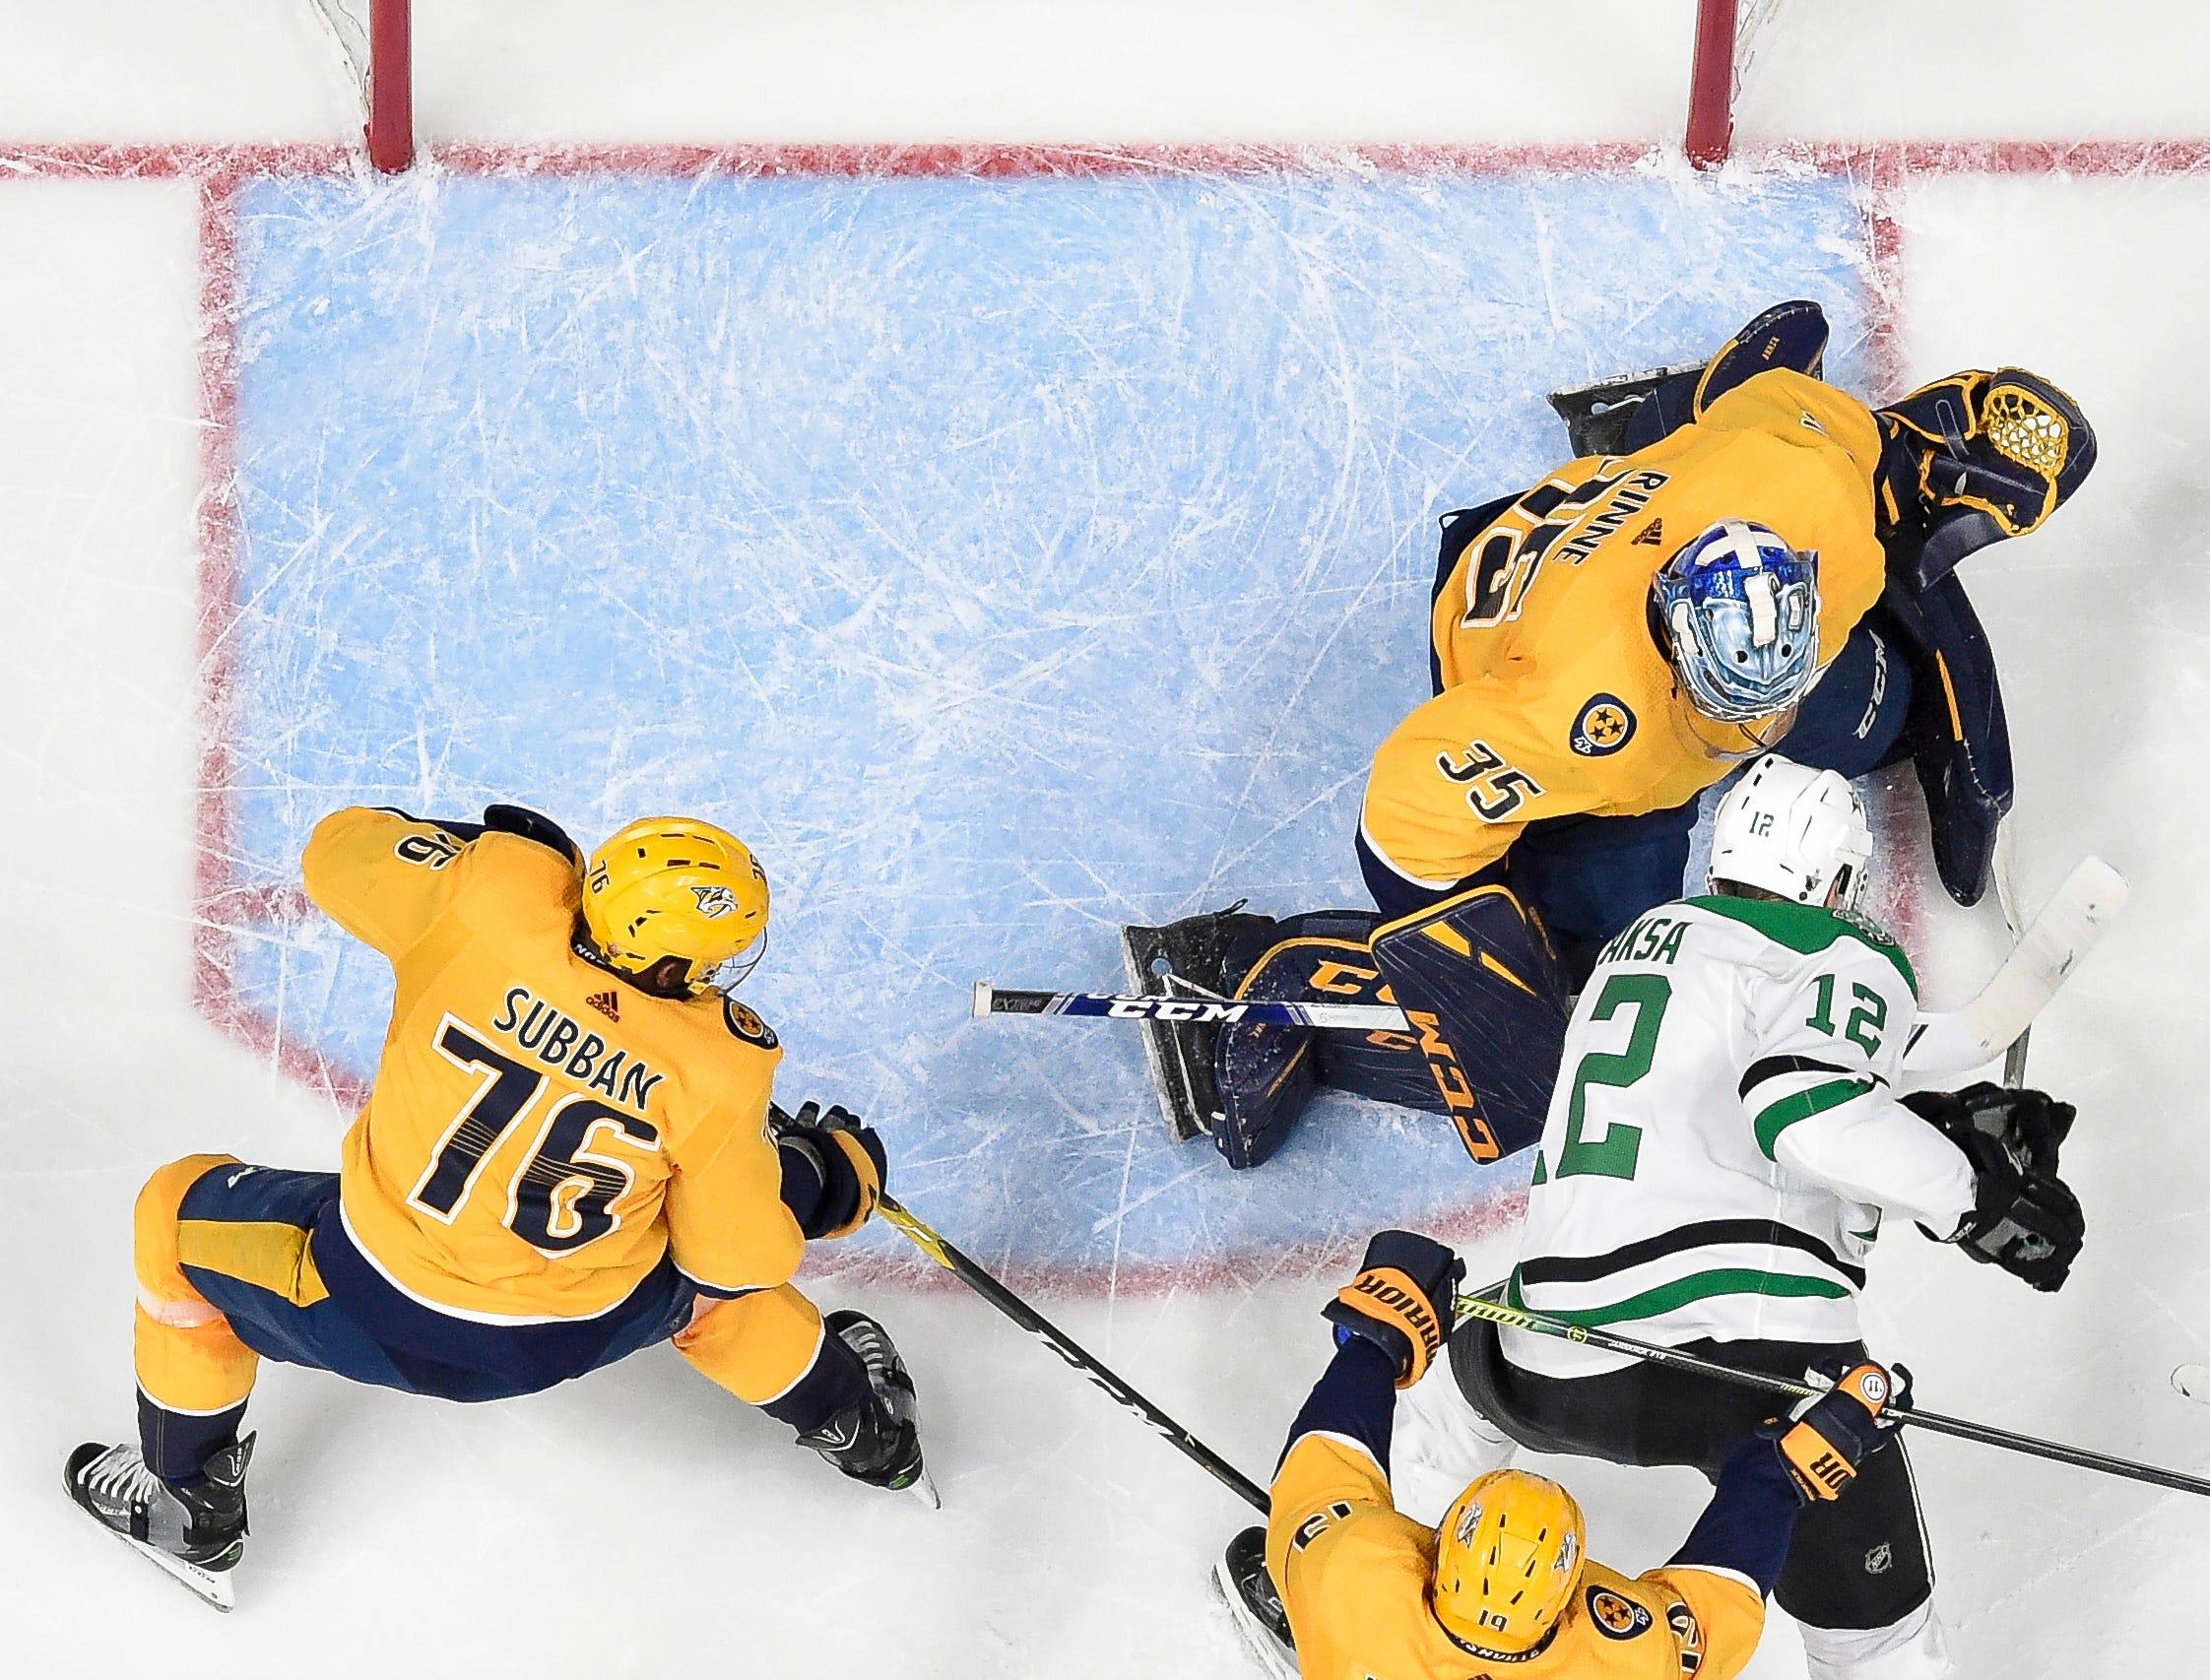 Dallas Stars center Radek Faksa (12) battles Nashville Predators goaltender Pekka Rinne (35) as during the first period of the divisional semifinal game at Bridgestone Arena in Nashville, Tenn., Wednesday, April 10, 2019.